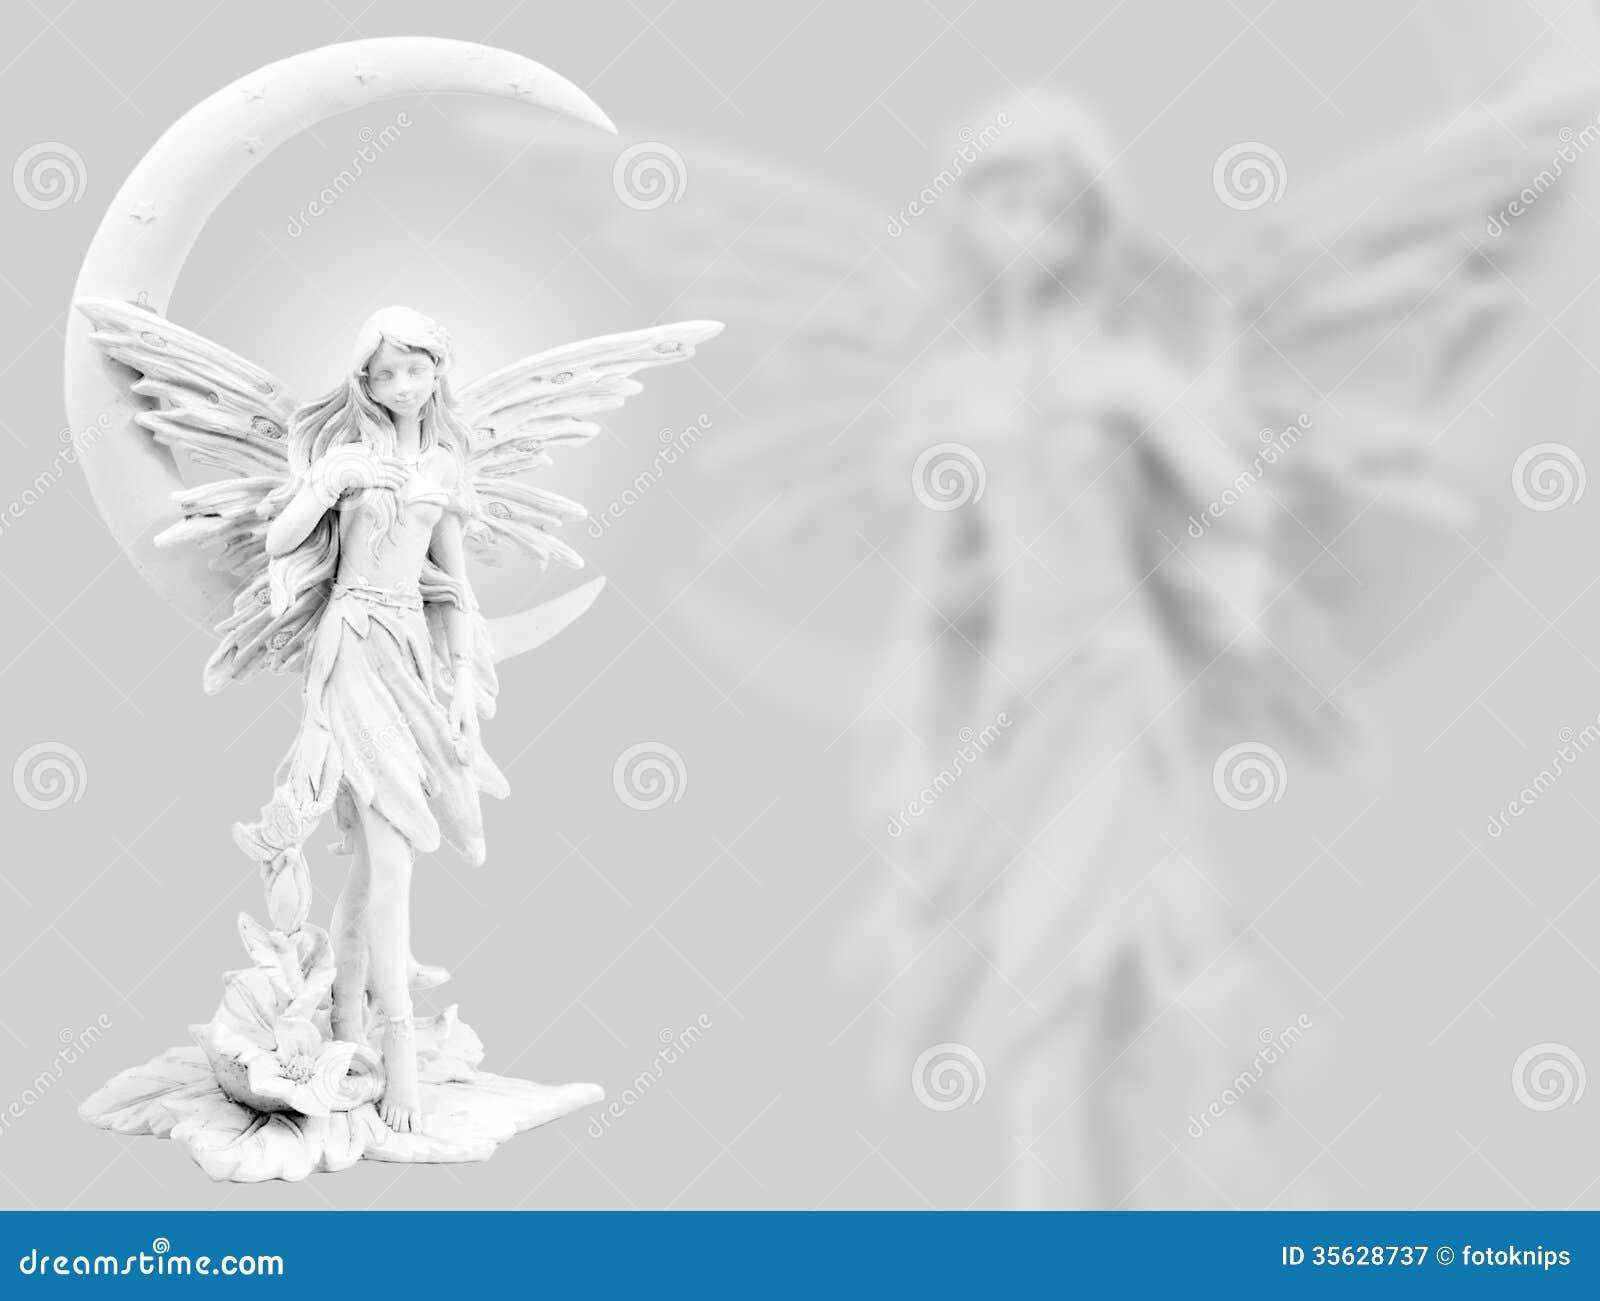 Angels, elves